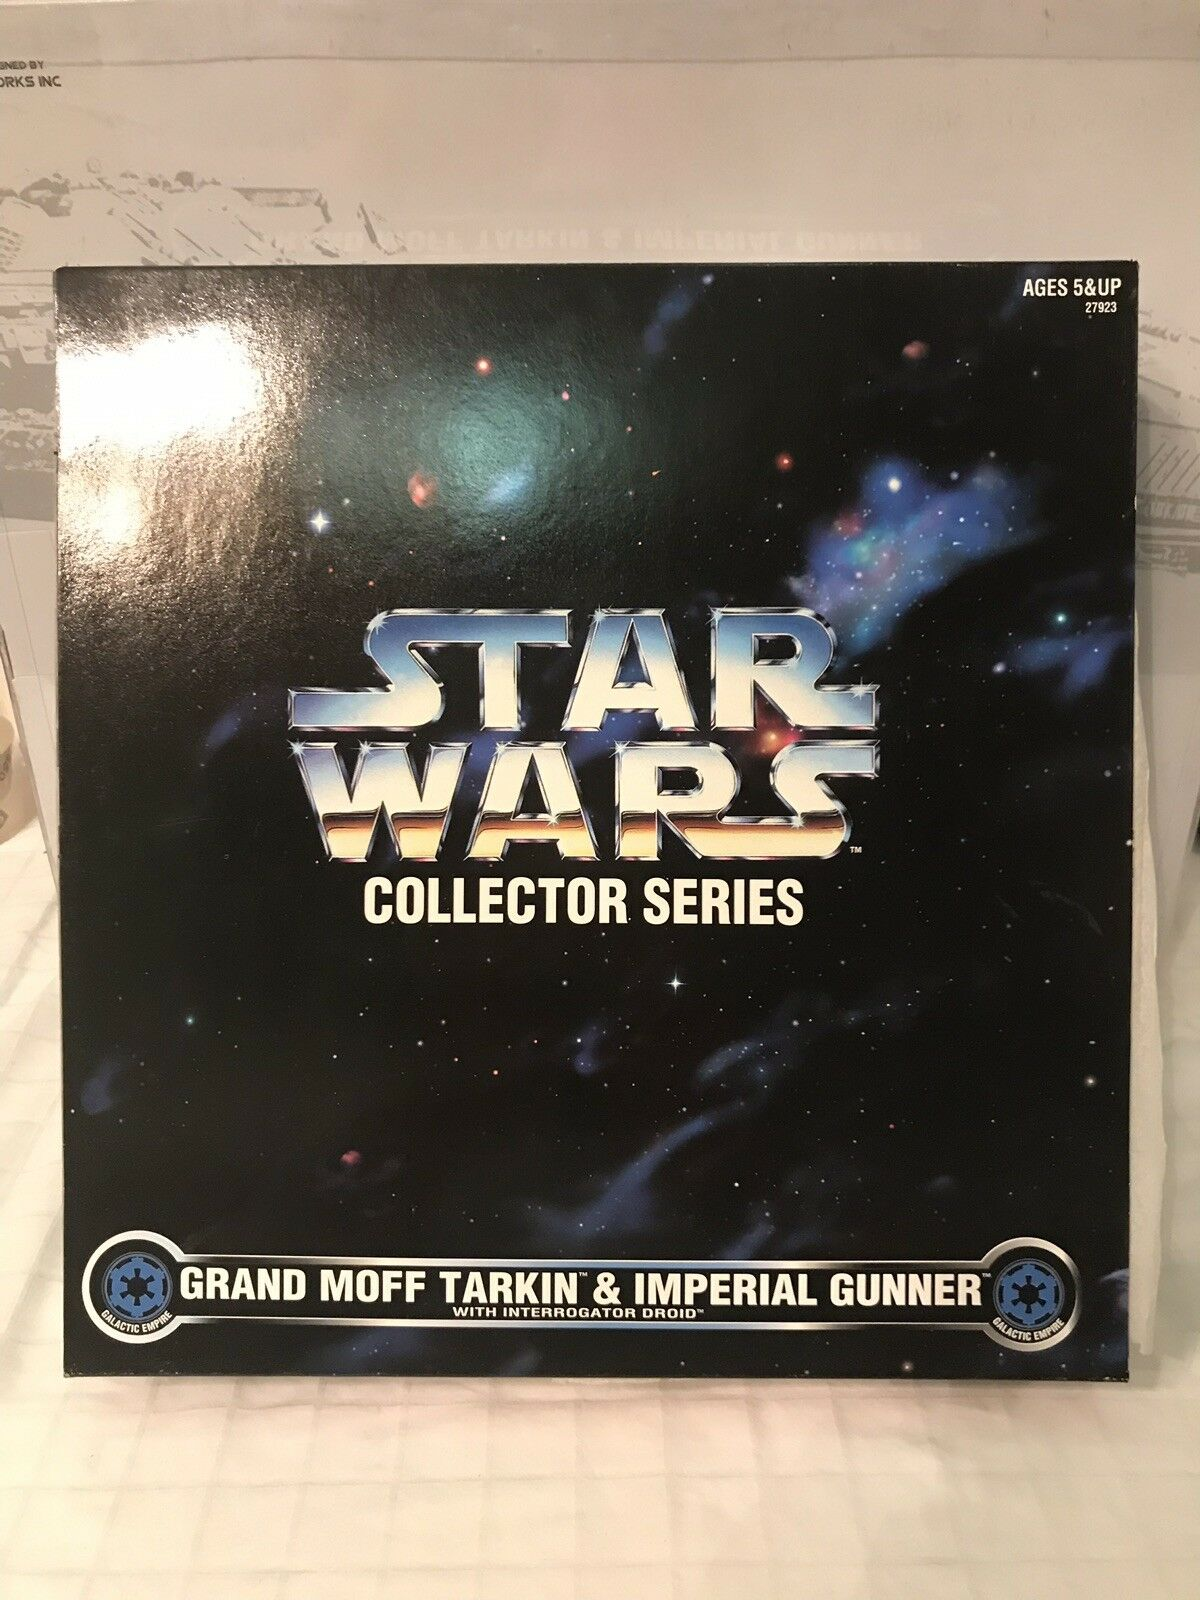 Star Wars Collector Series Grand Moff Tarkin & Imperial Gunner